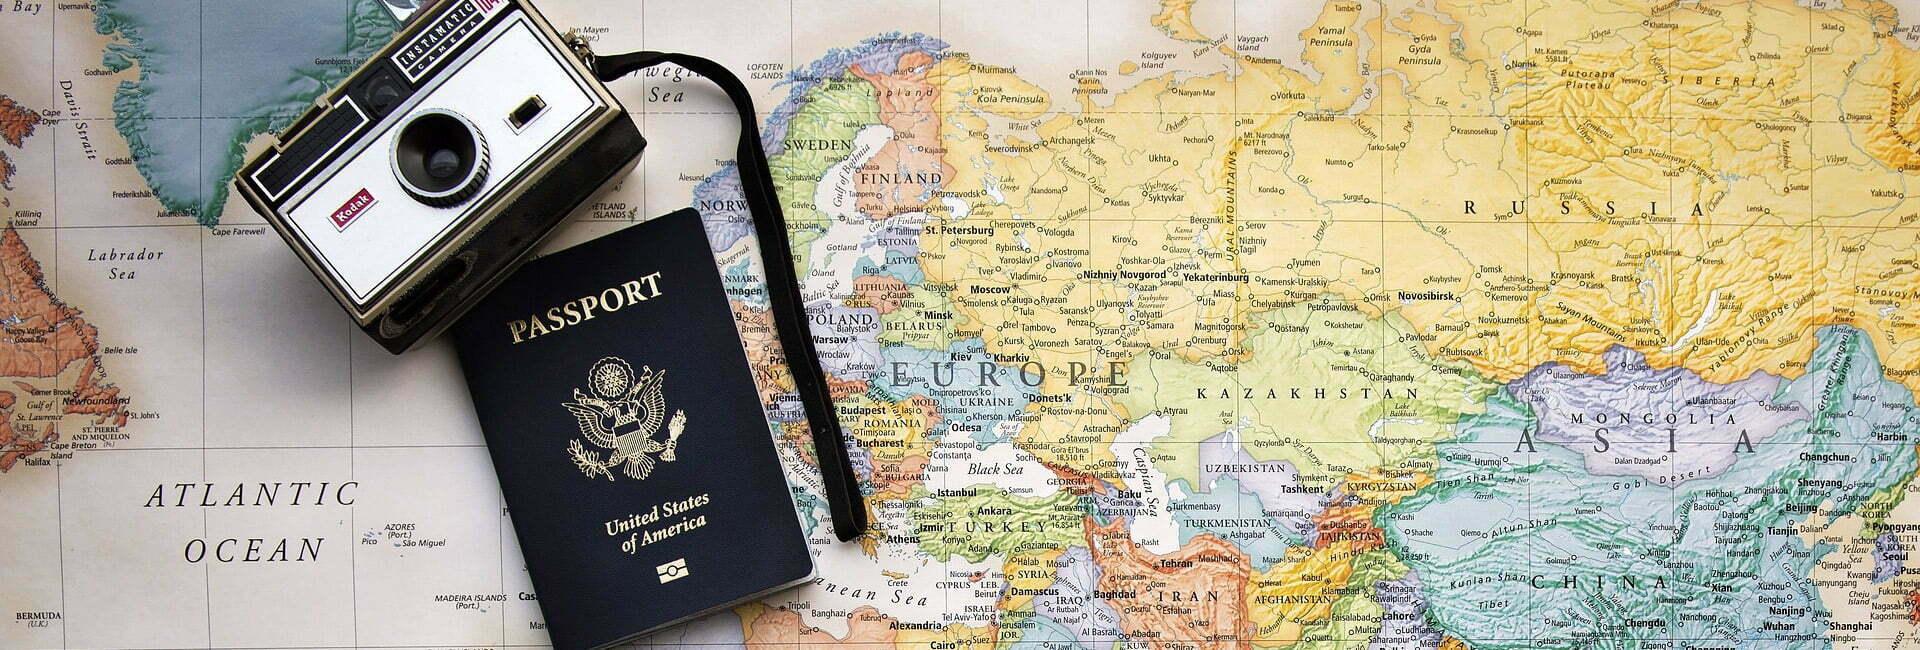 easy to understand Laos visa formalities